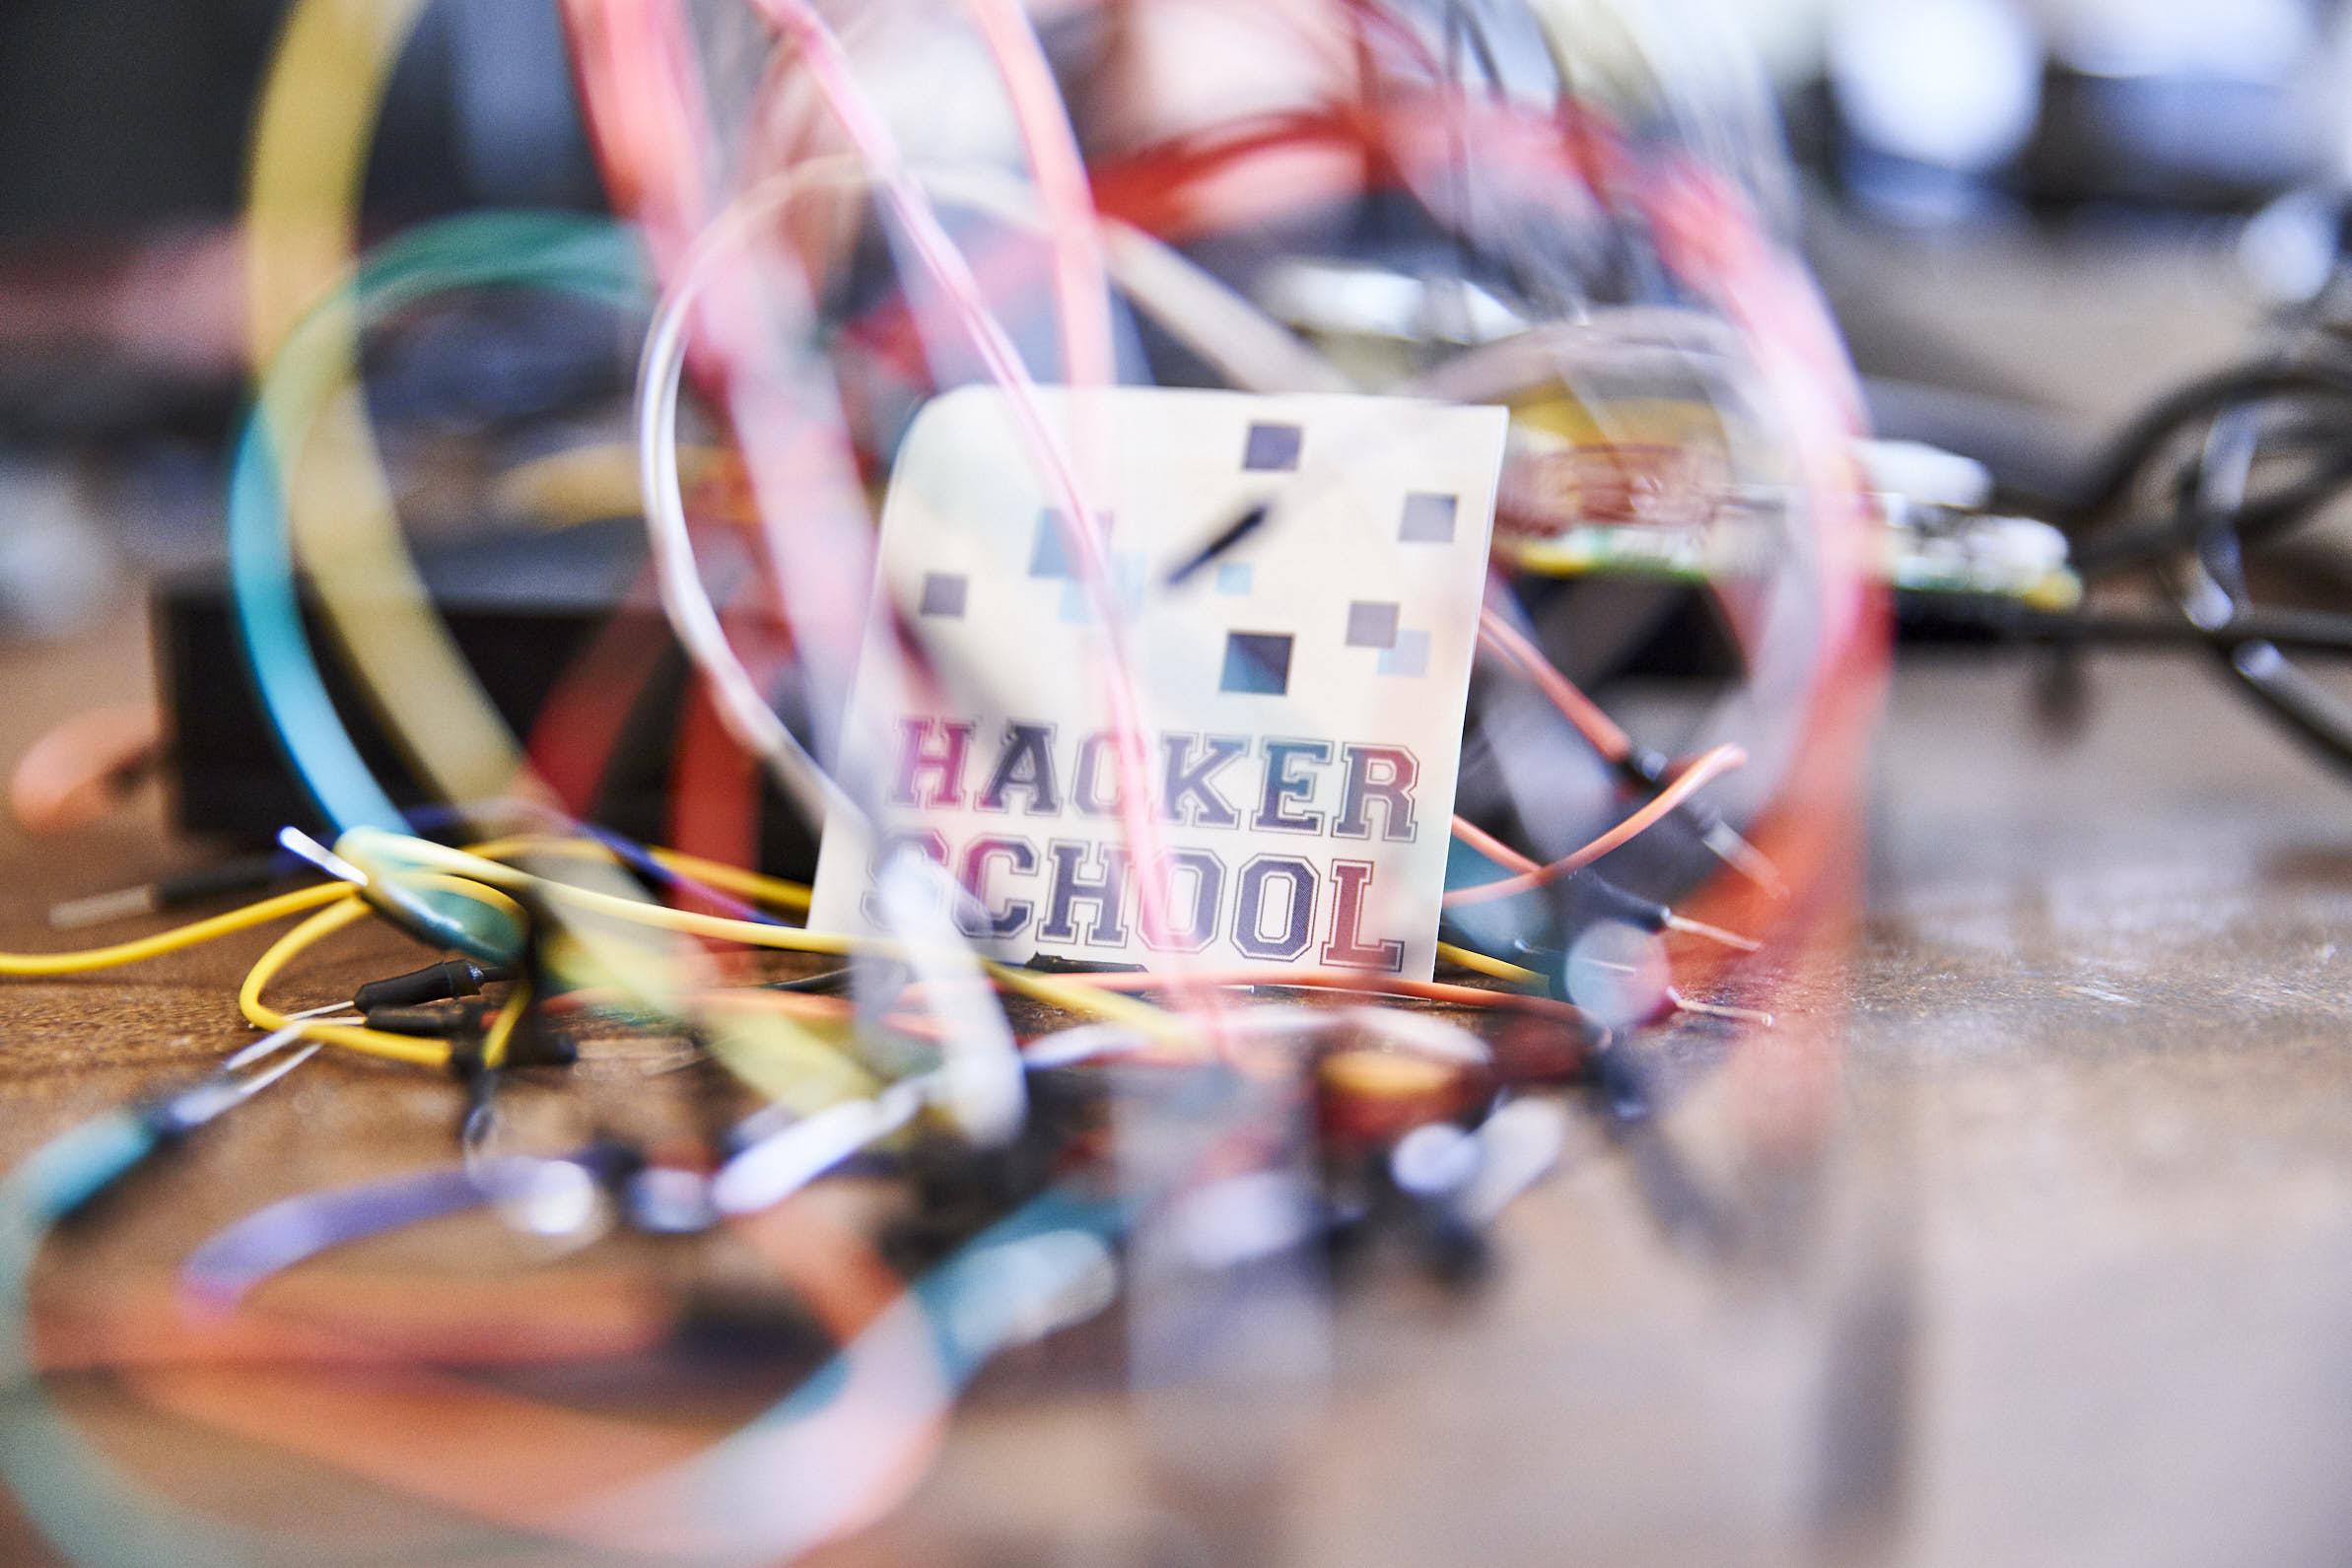 Hacker School / i3 e.V.